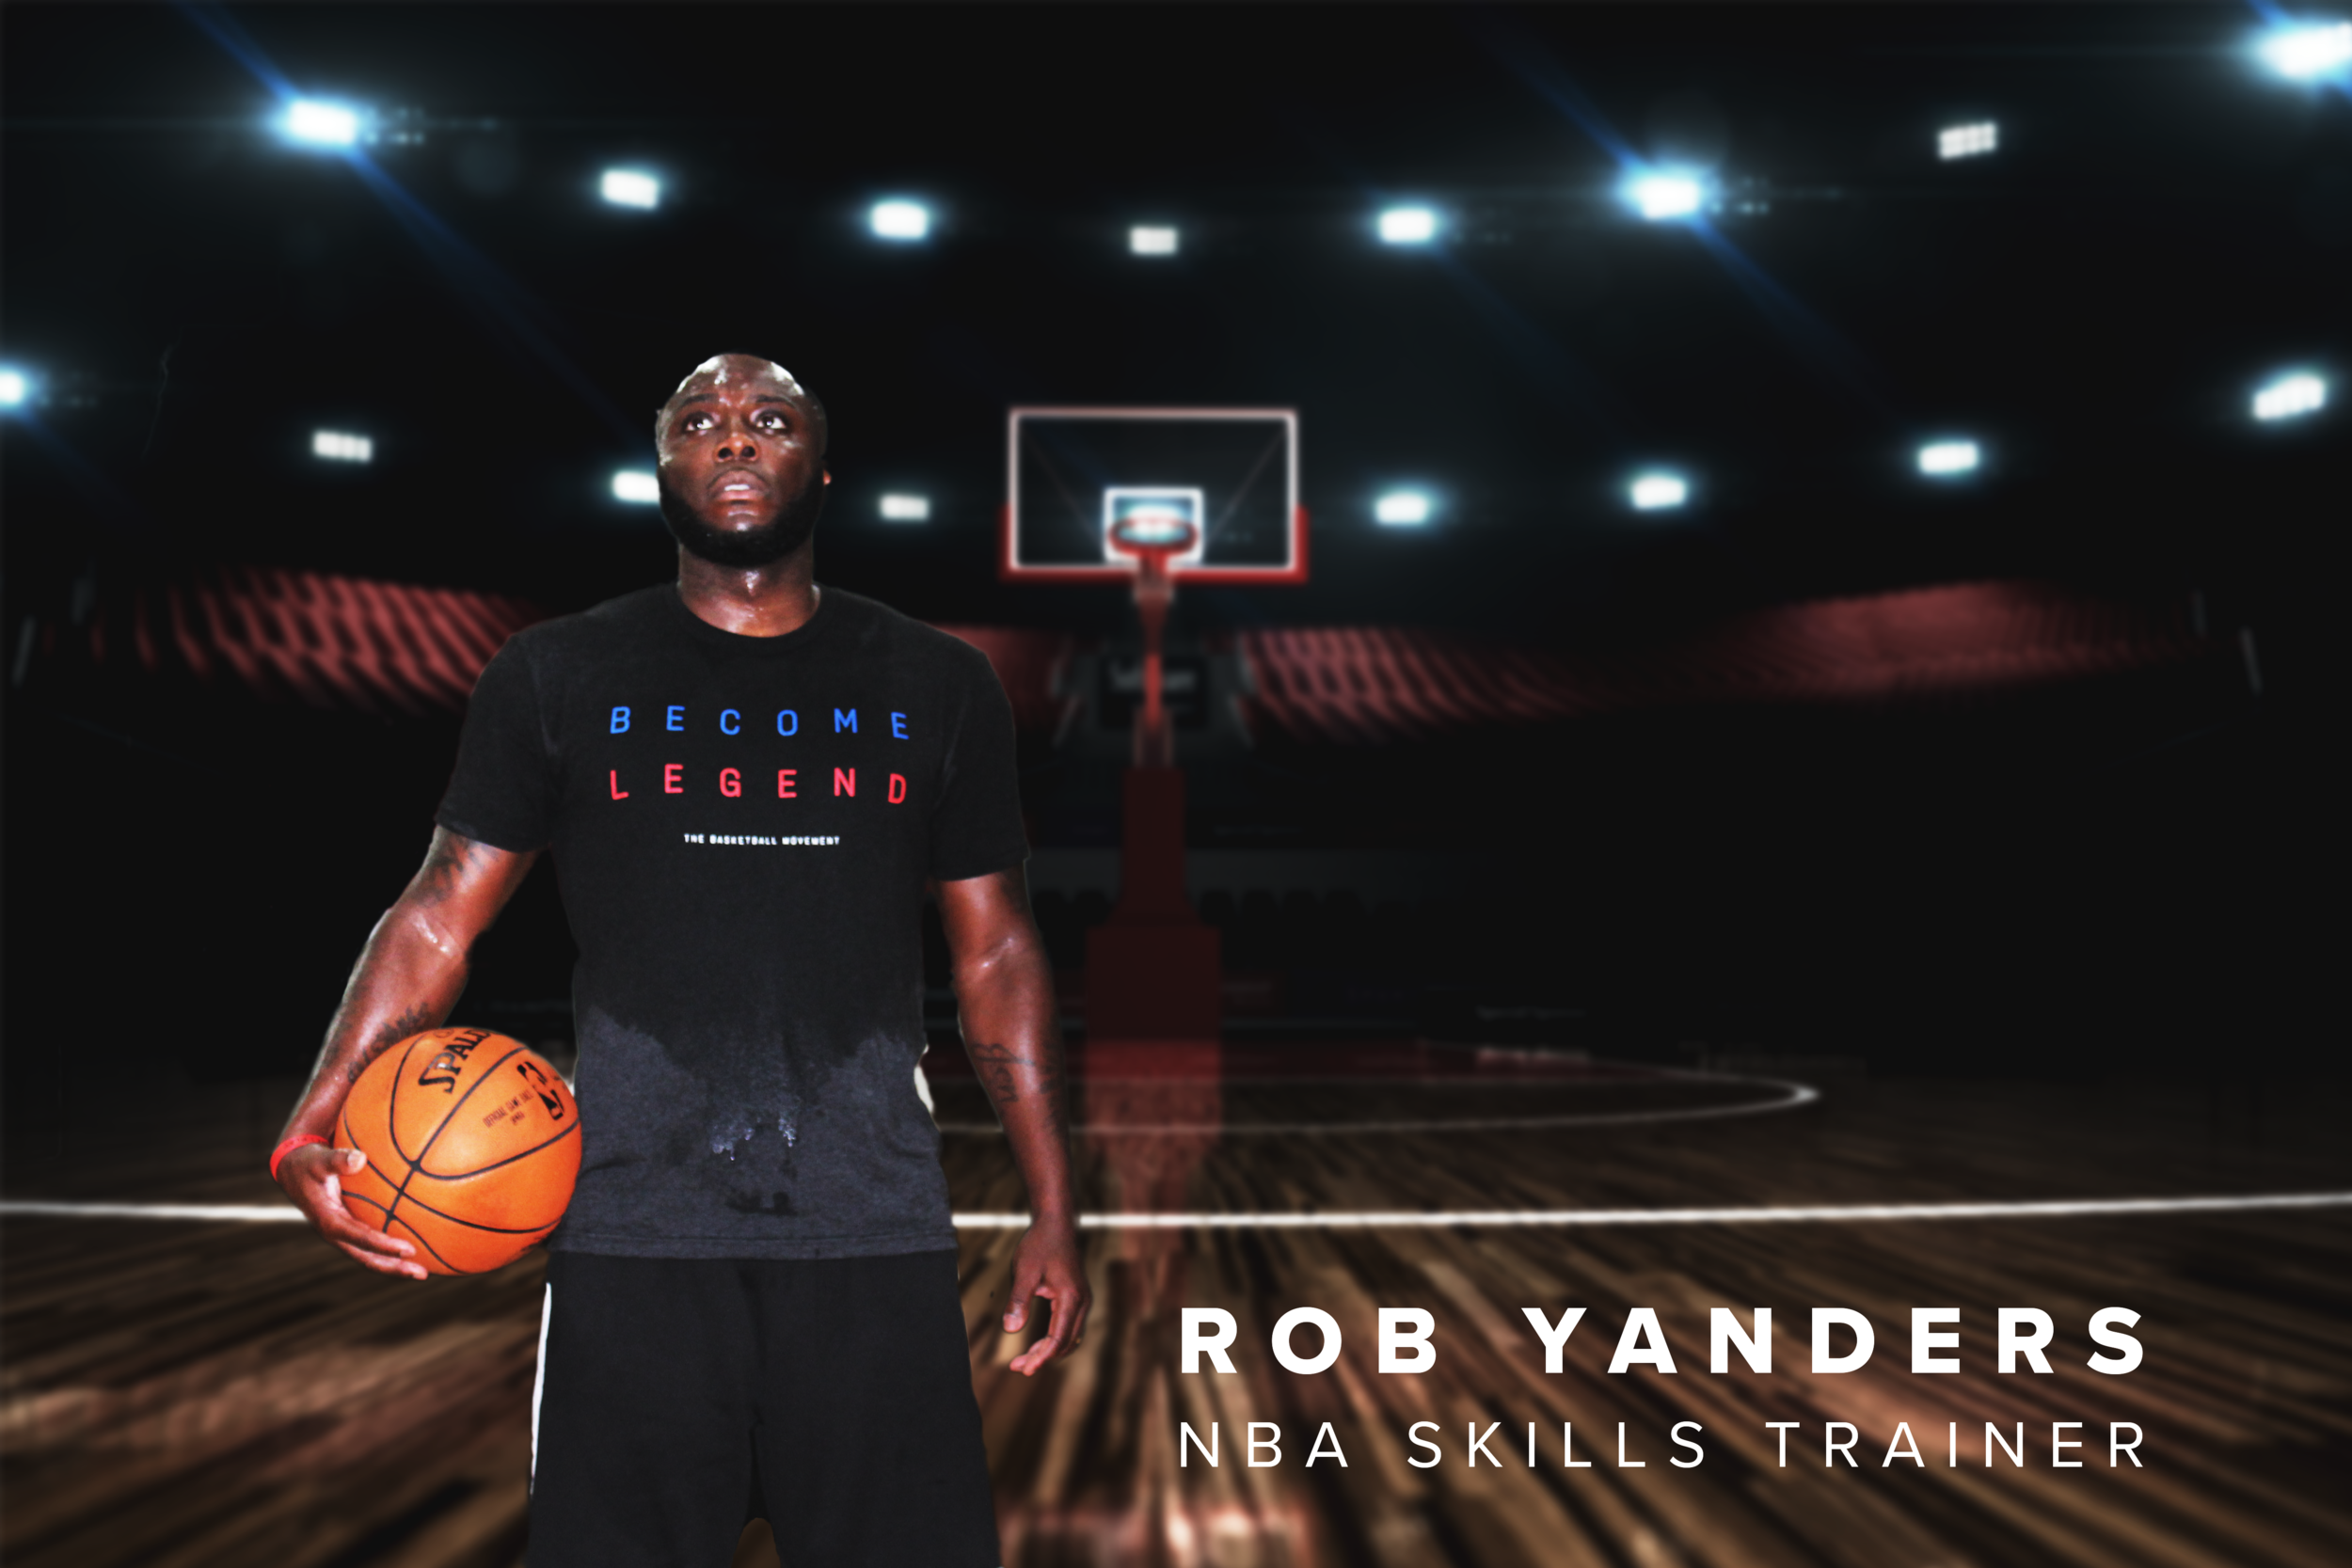 Become Legend NBA Skills.png